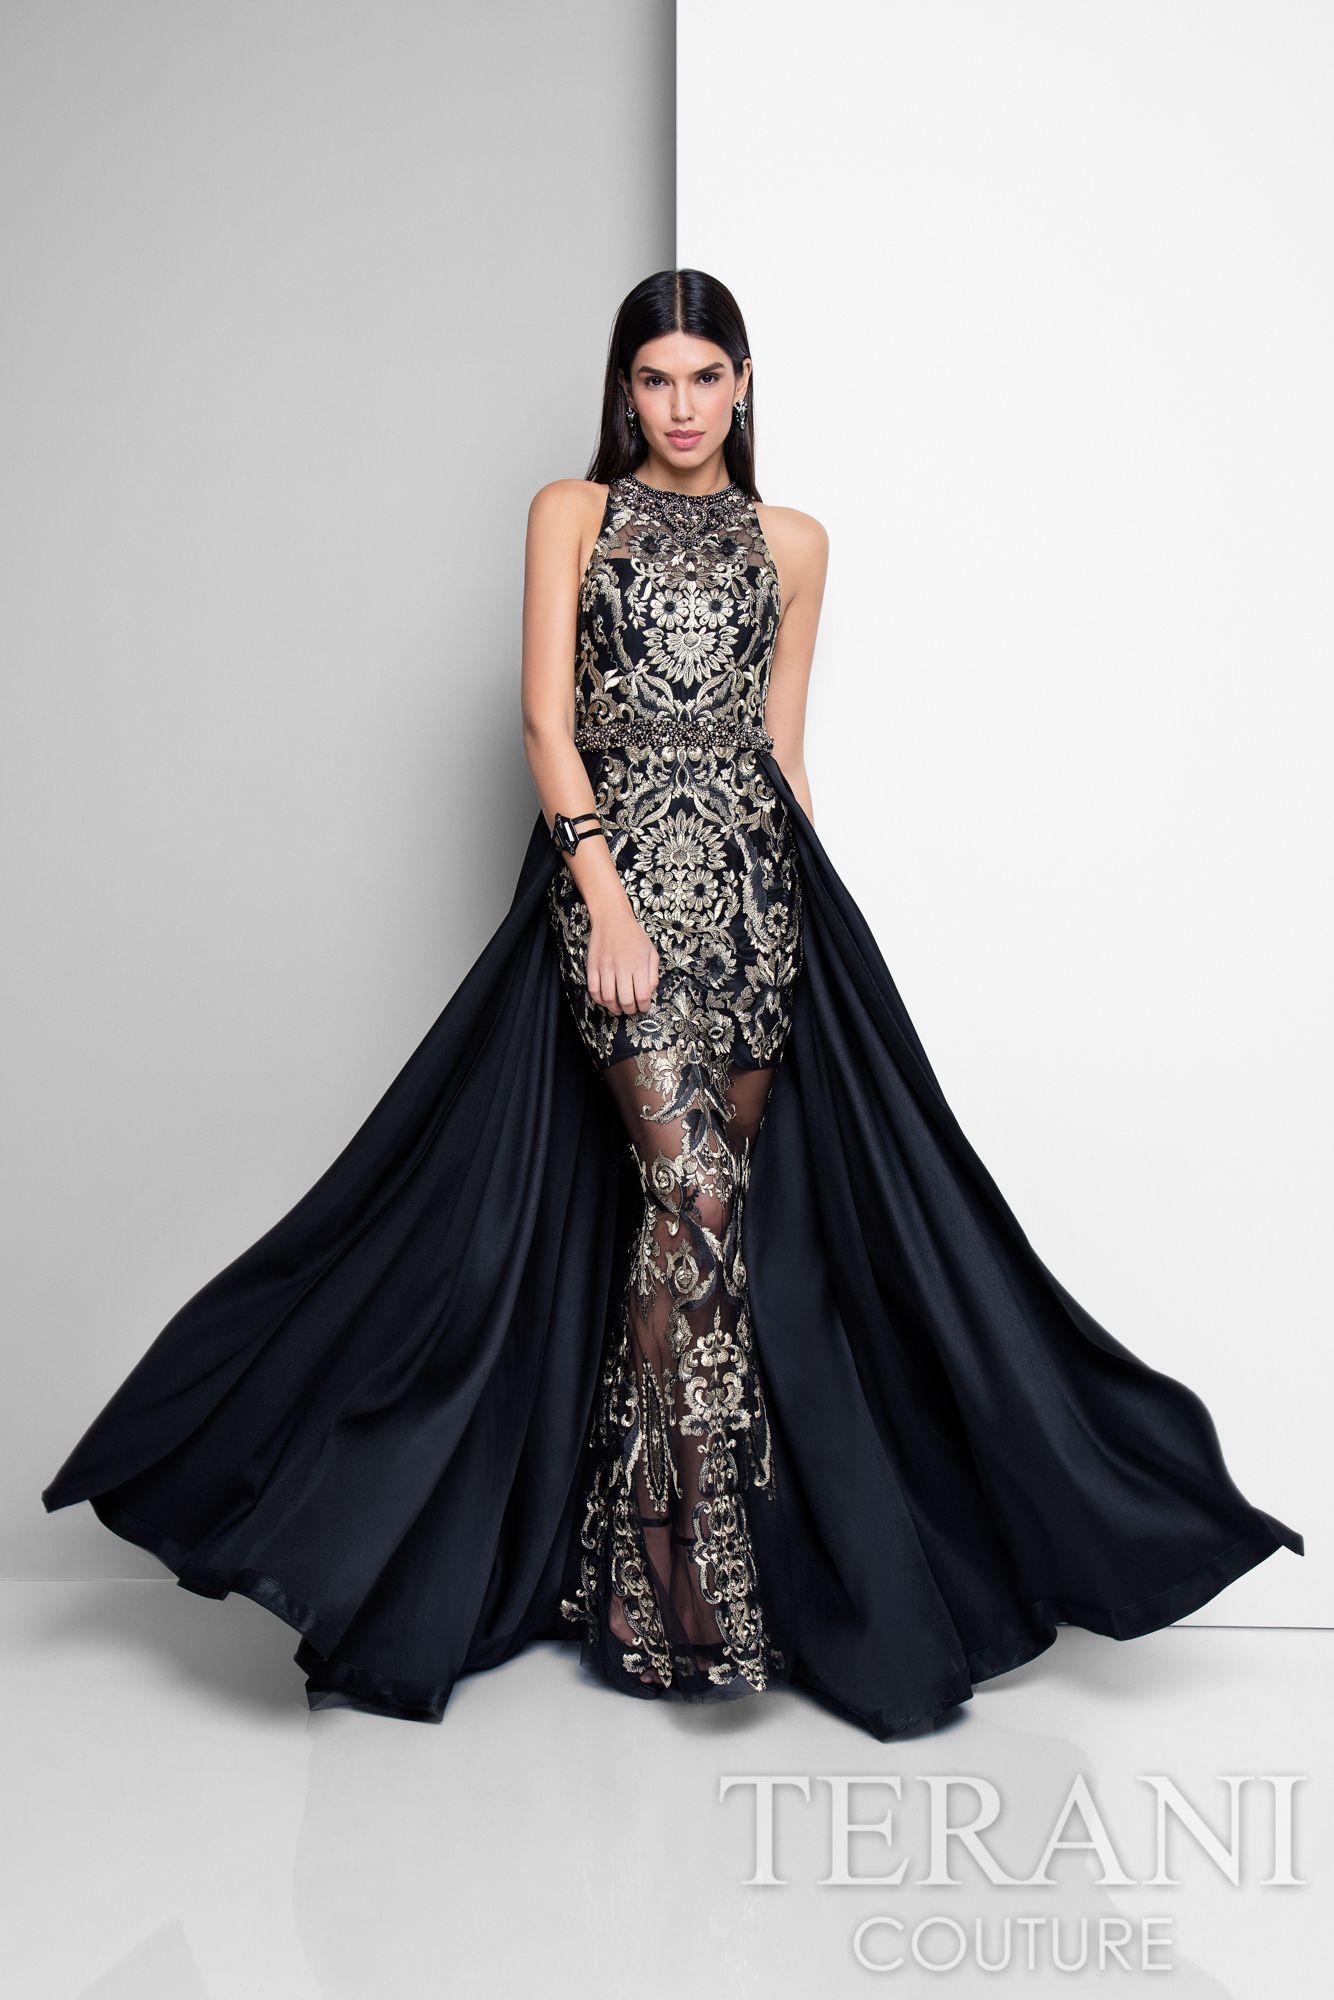 Terani Couture 1712E3648 - Shop more designer prom and evening ...